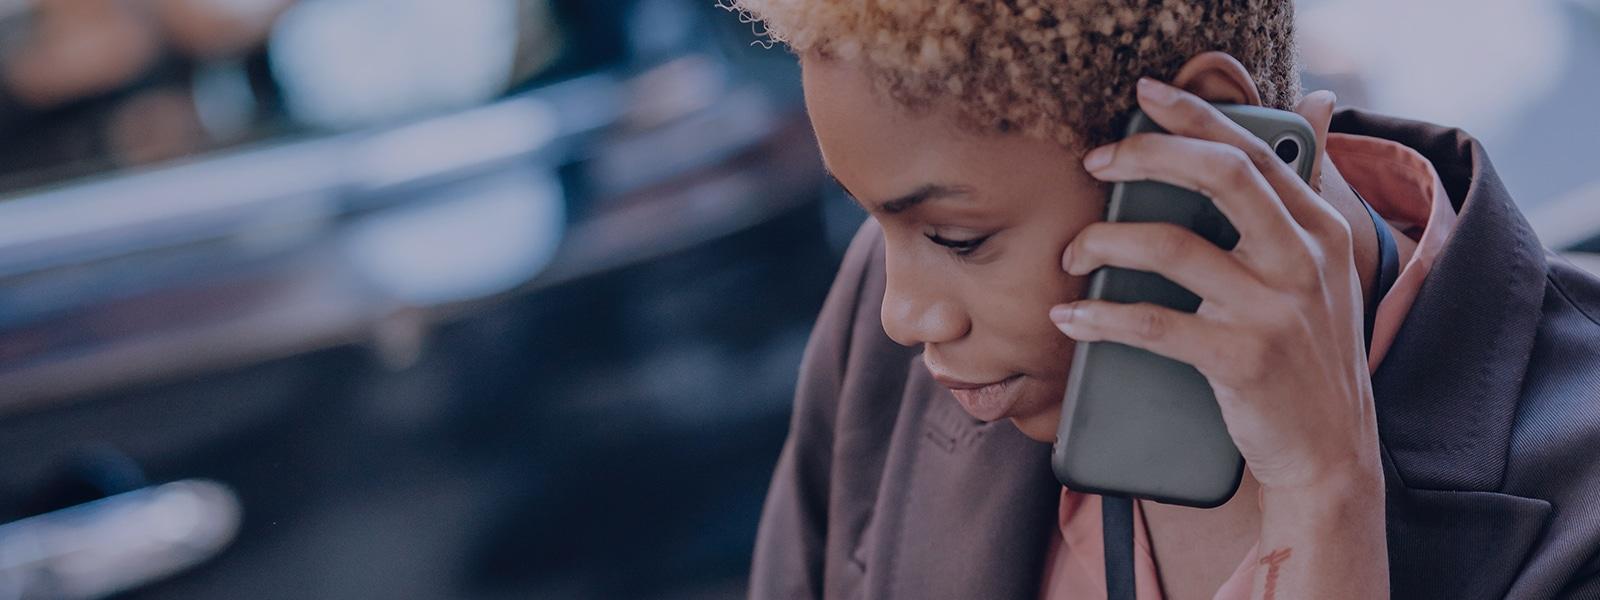 Kvinde taler i telefon med callcenter